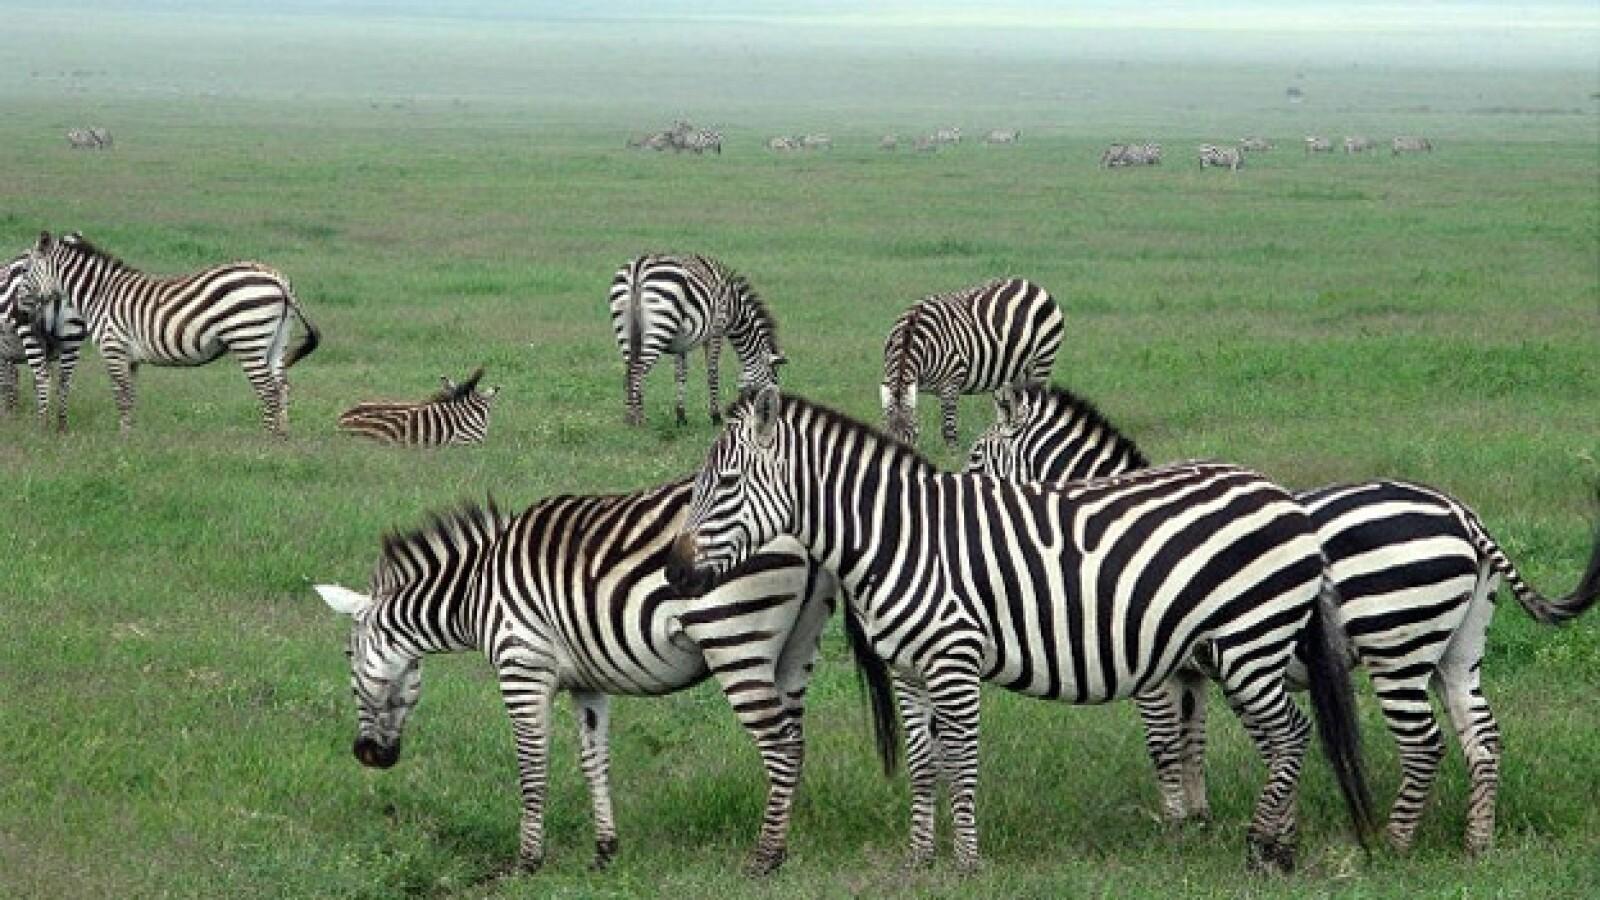 Tanzania: Take a ride on the wild side elefante cebra